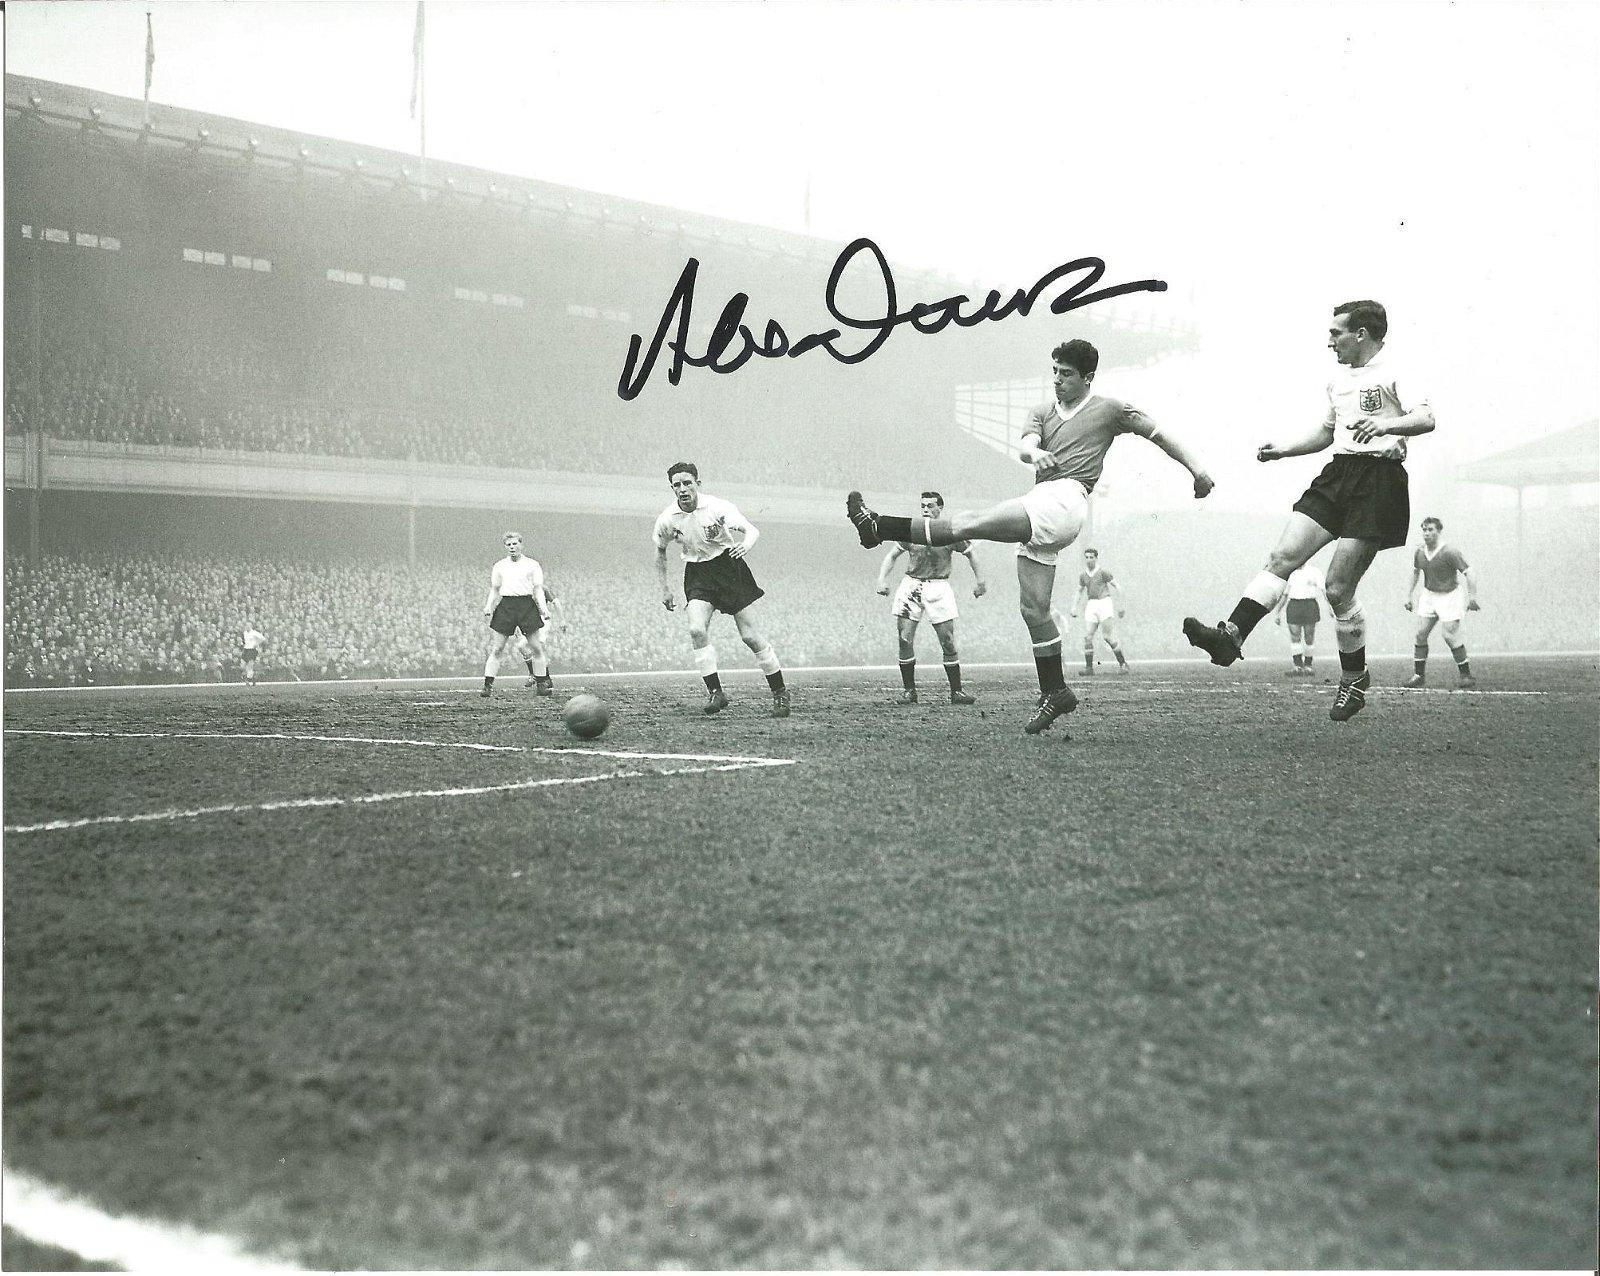 Alex Dawson 10x8 signed black and white photo pictured